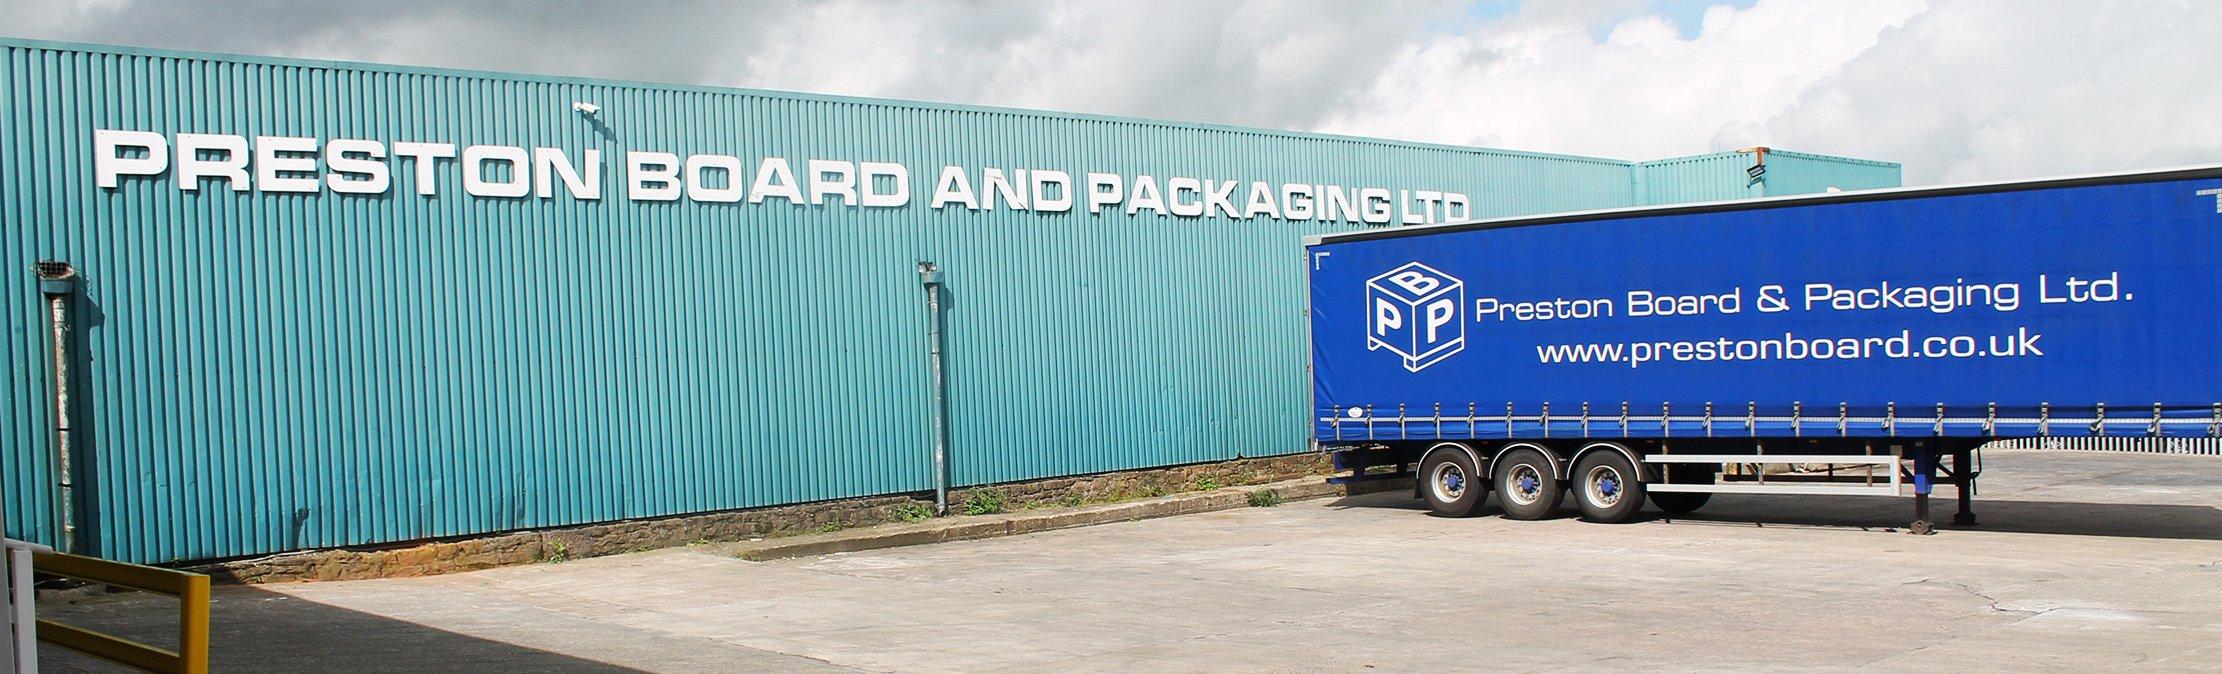 Preston Board and Packaging Ltd